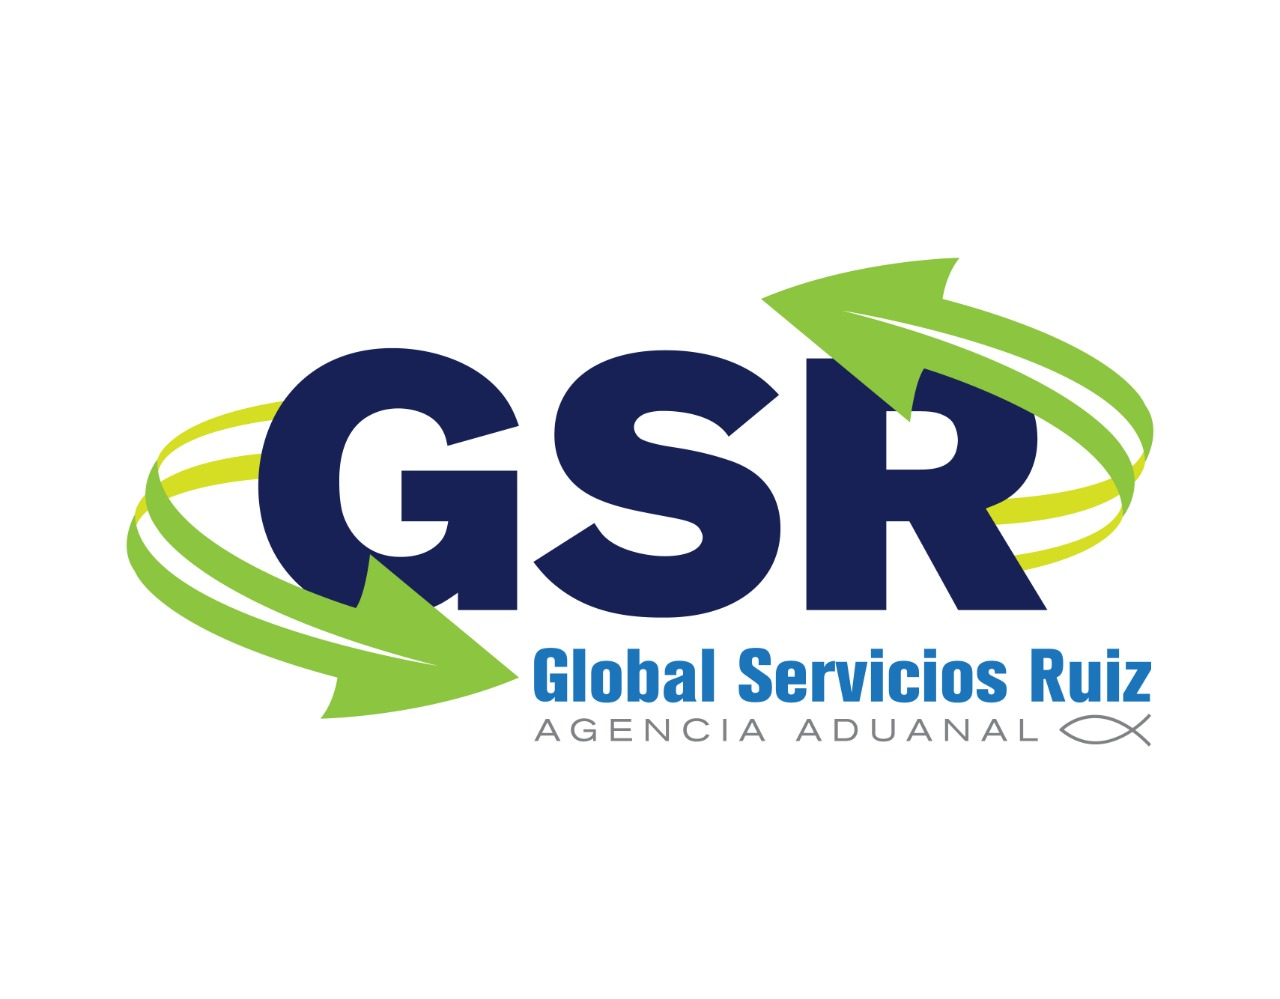 Global Servicios Ruiz S.A Custom Agency